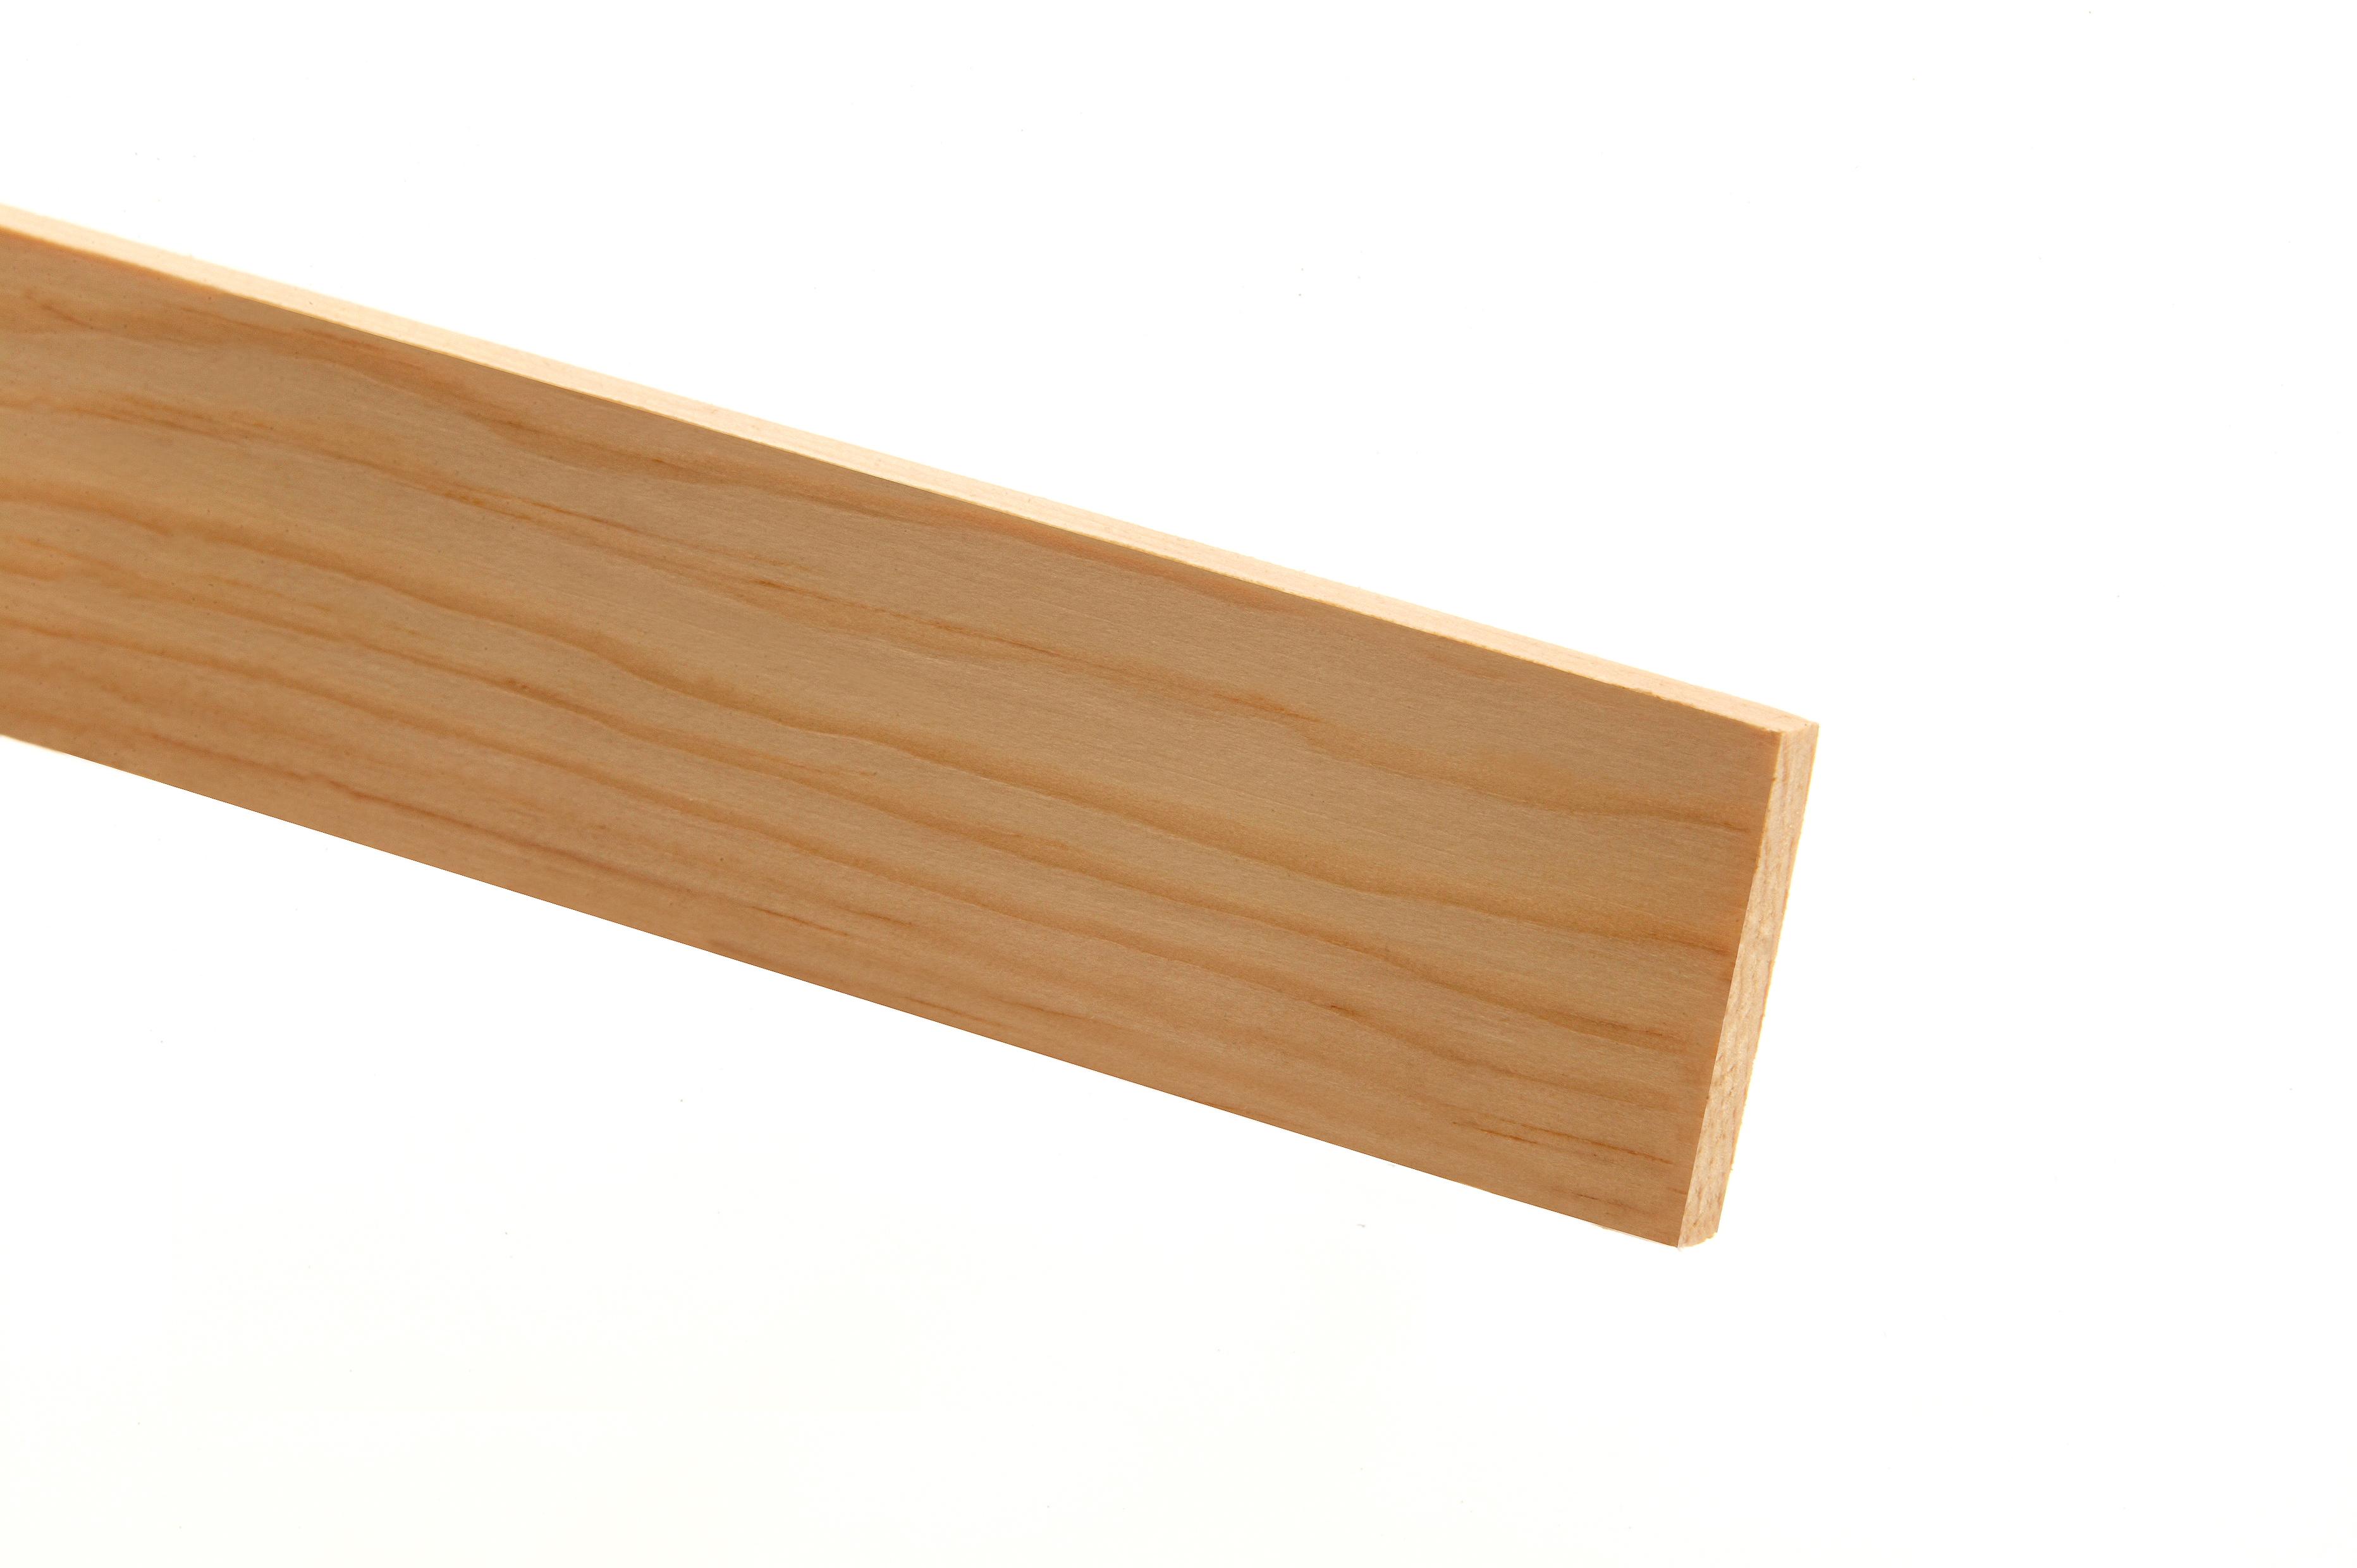 10 Pine PSE Stripwood 15 x 71 x 2400mm